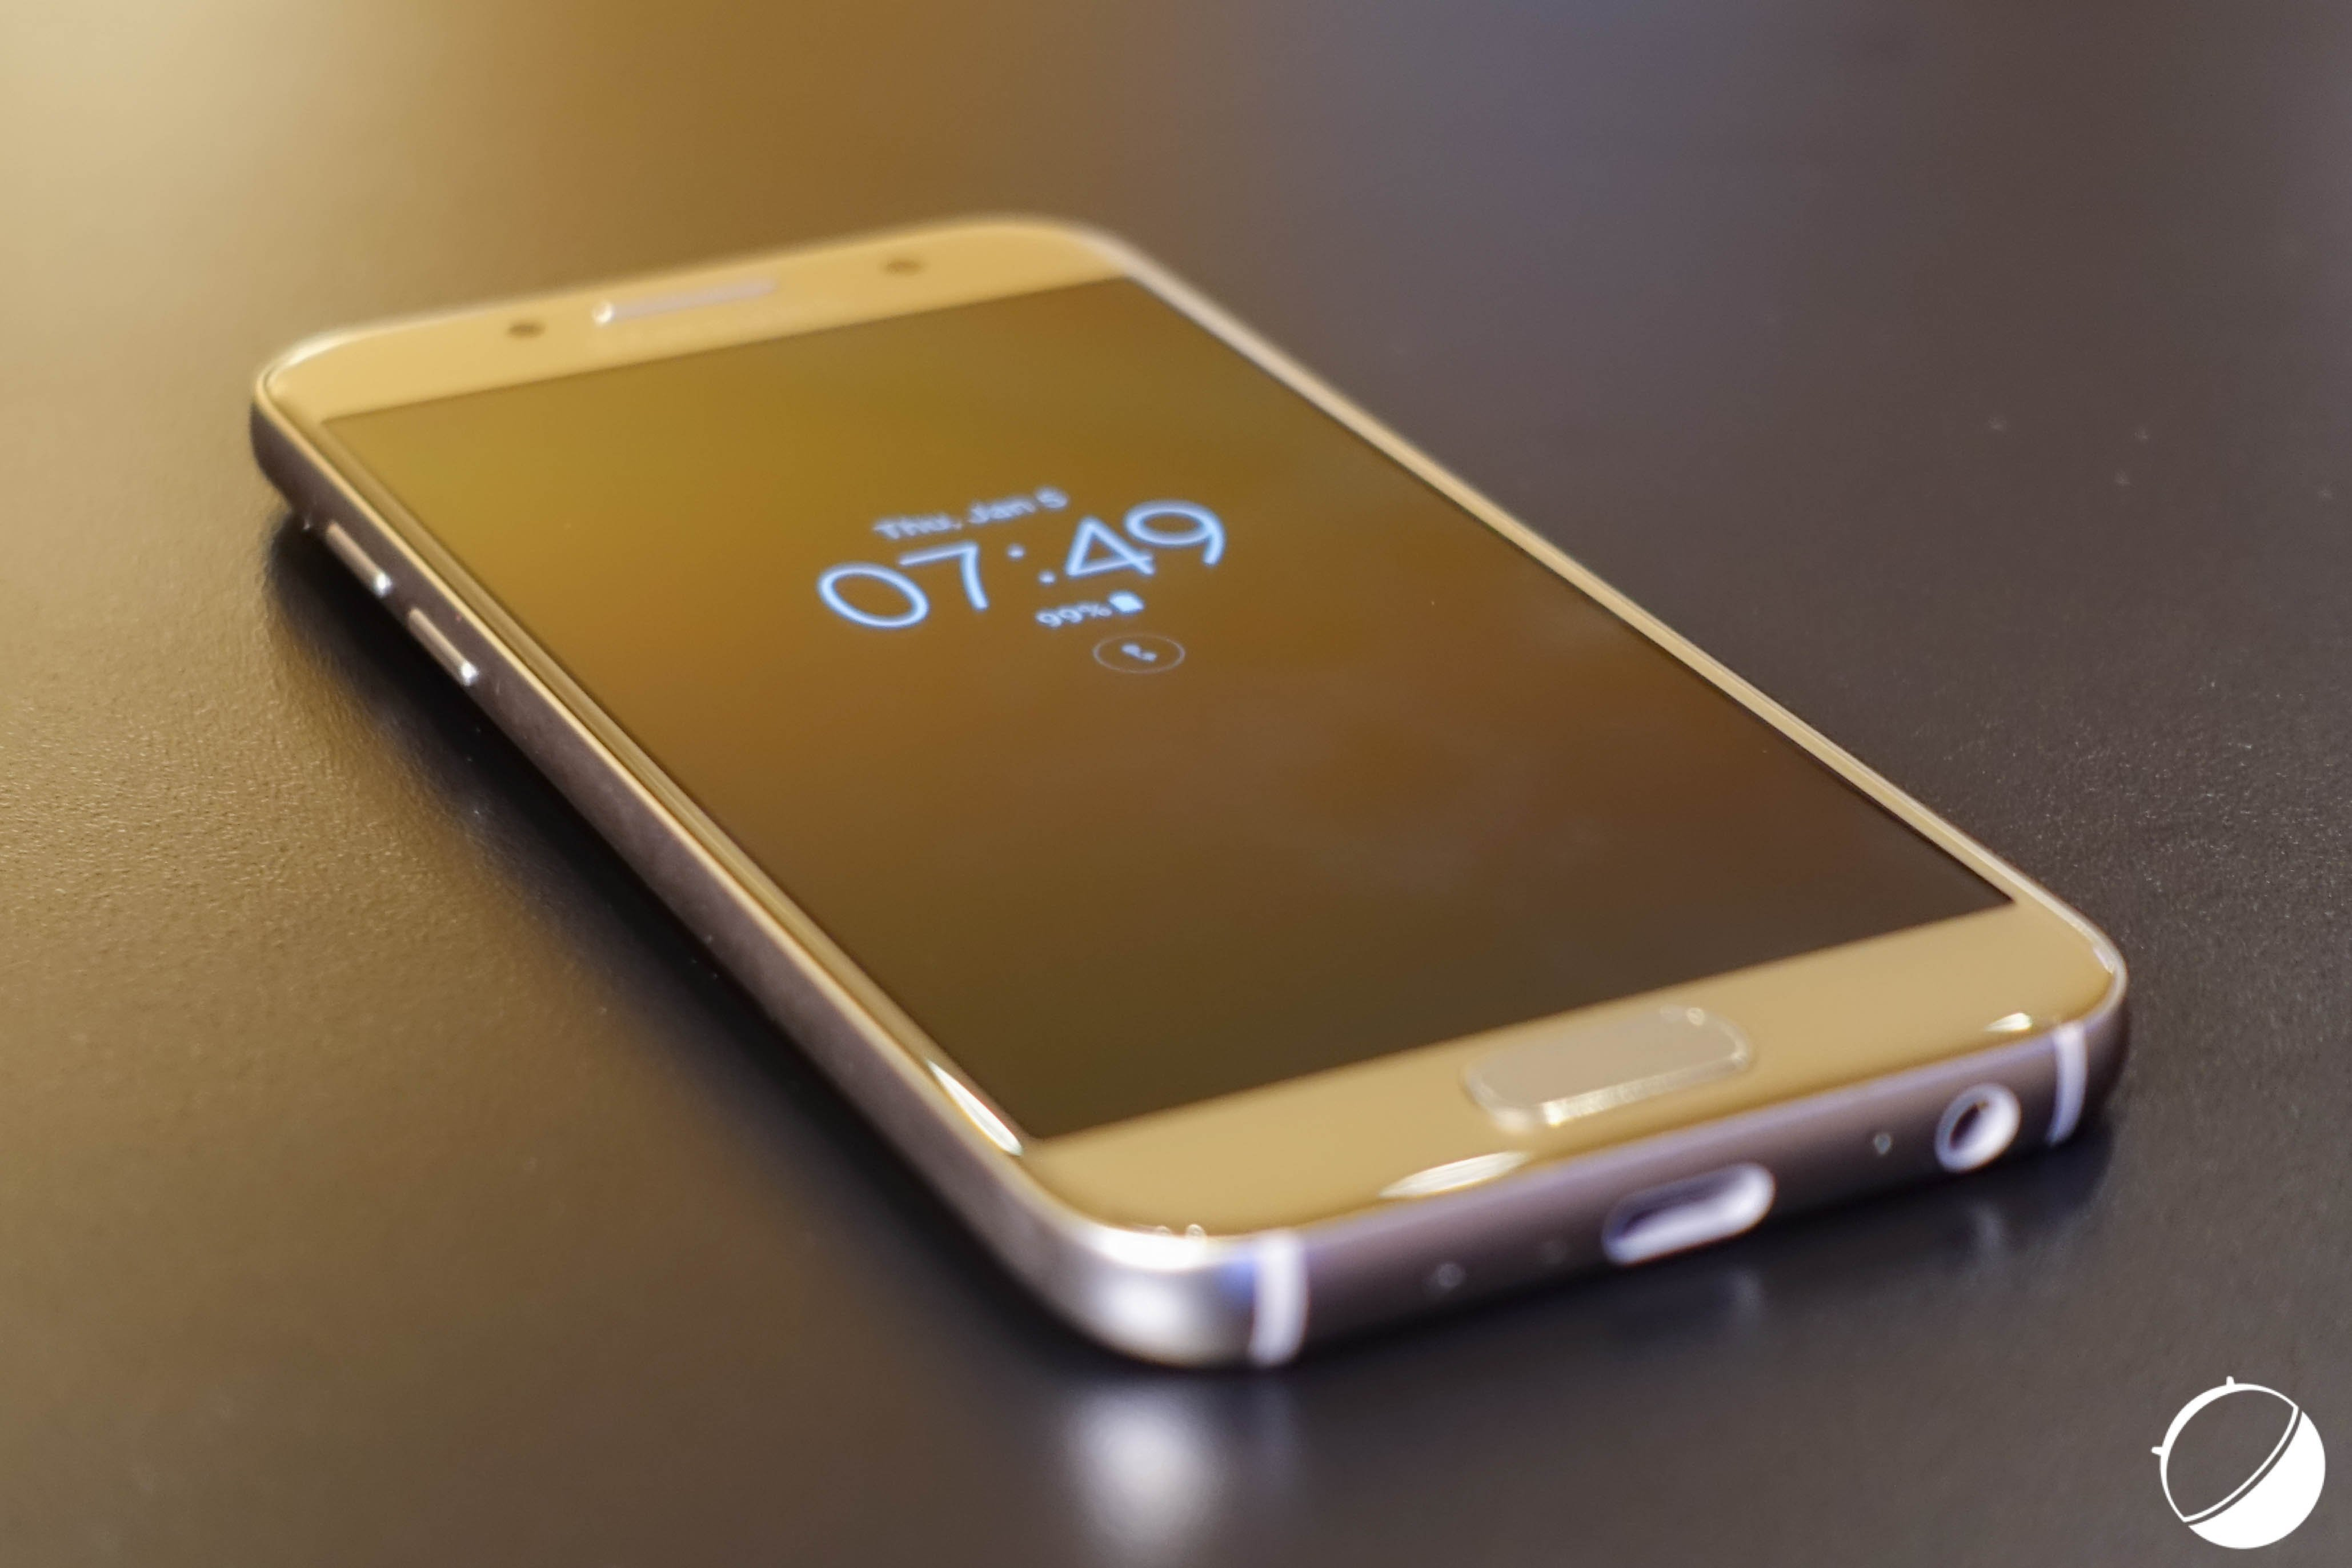 Le Samsung Galaxy A5 de 2014 va recevoir Android 7.0 Nougat